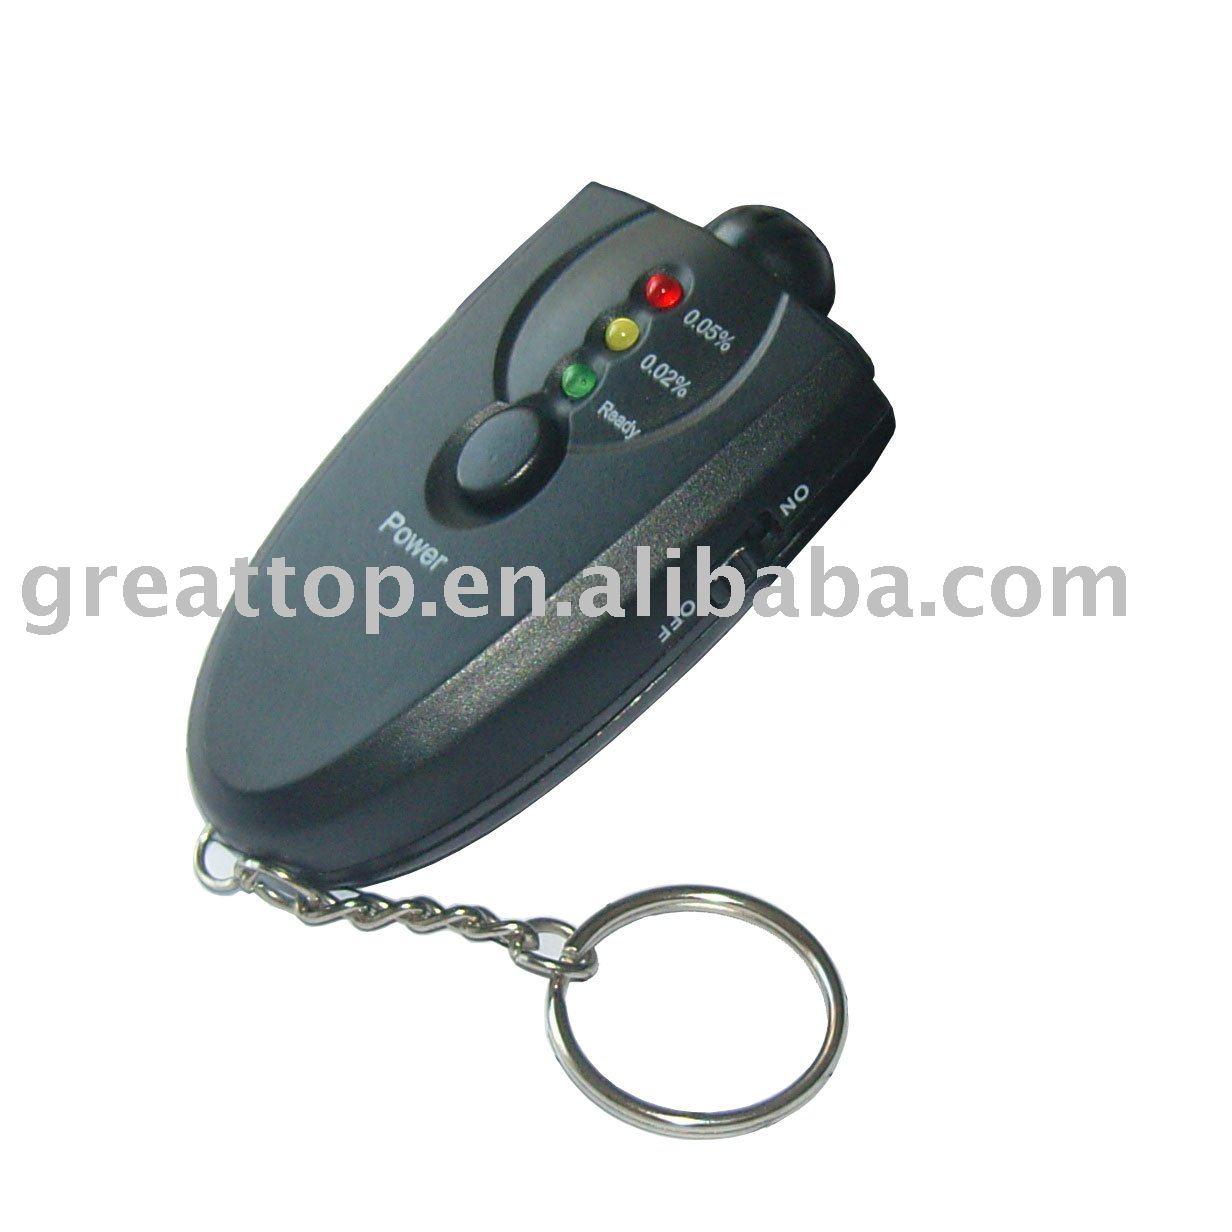 10pc/set Keychain led alcohol tester (GT-ALT-01)(China (Mainland))